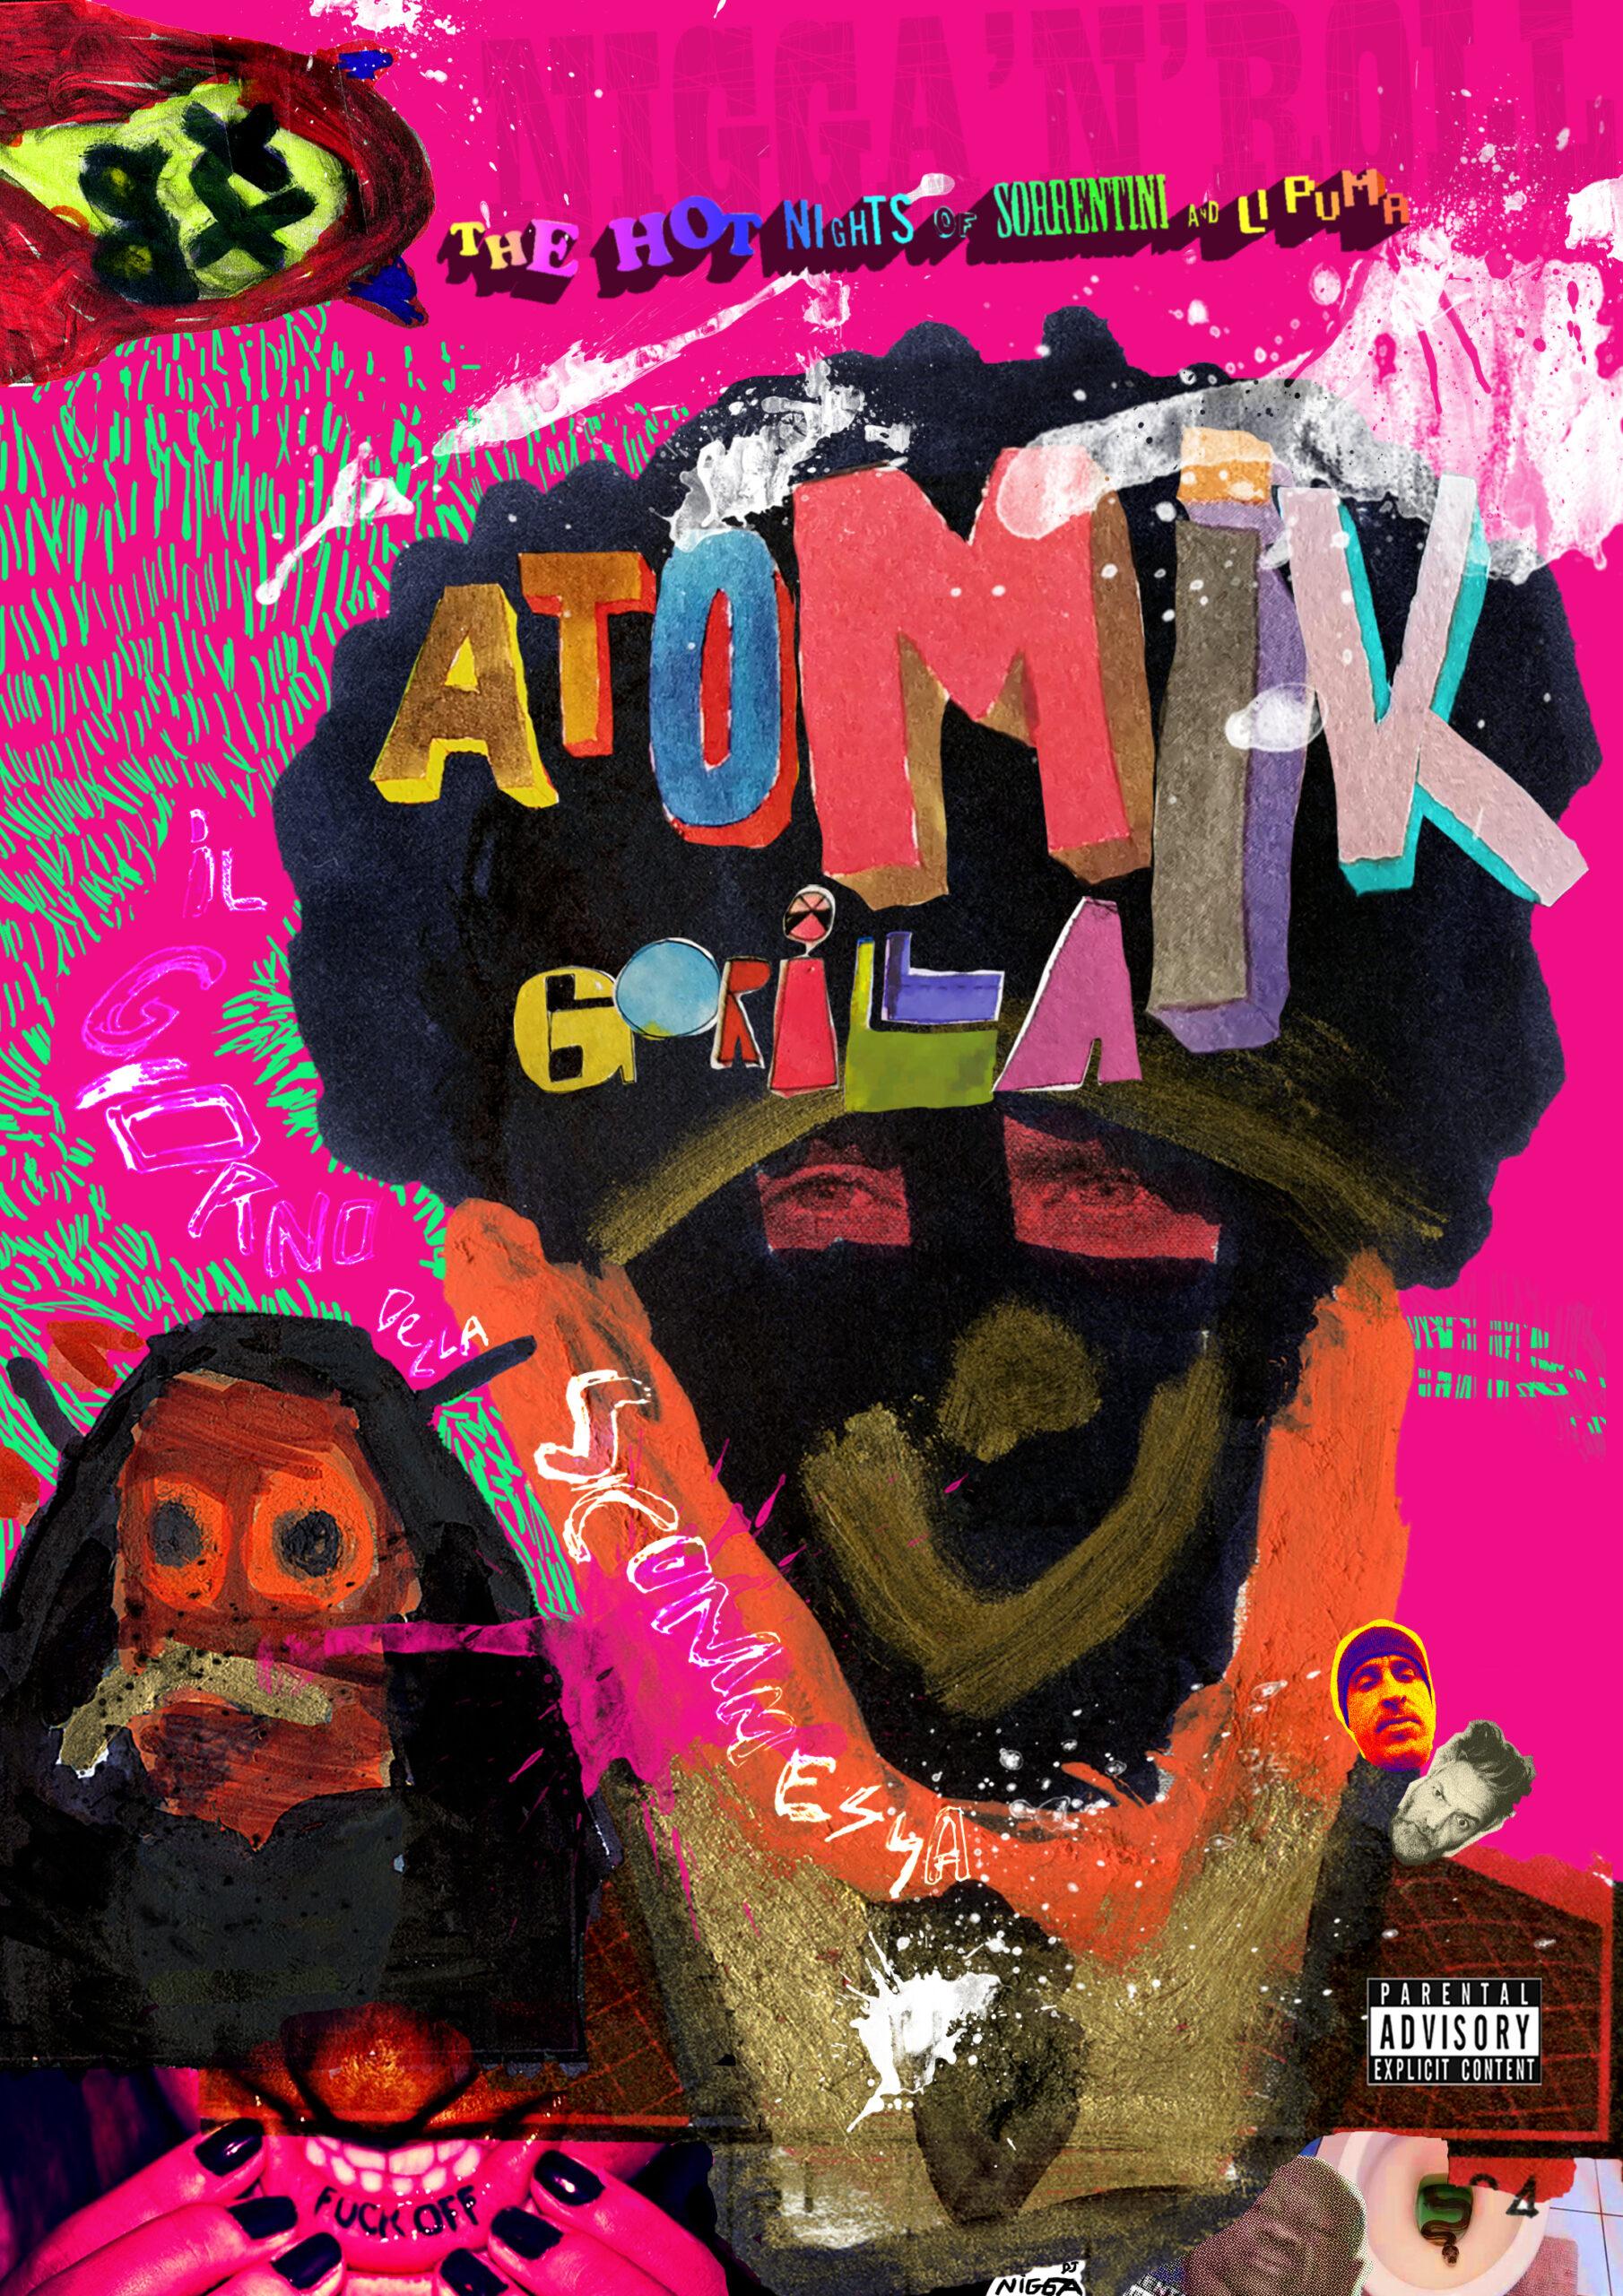 Atomik Gorilla